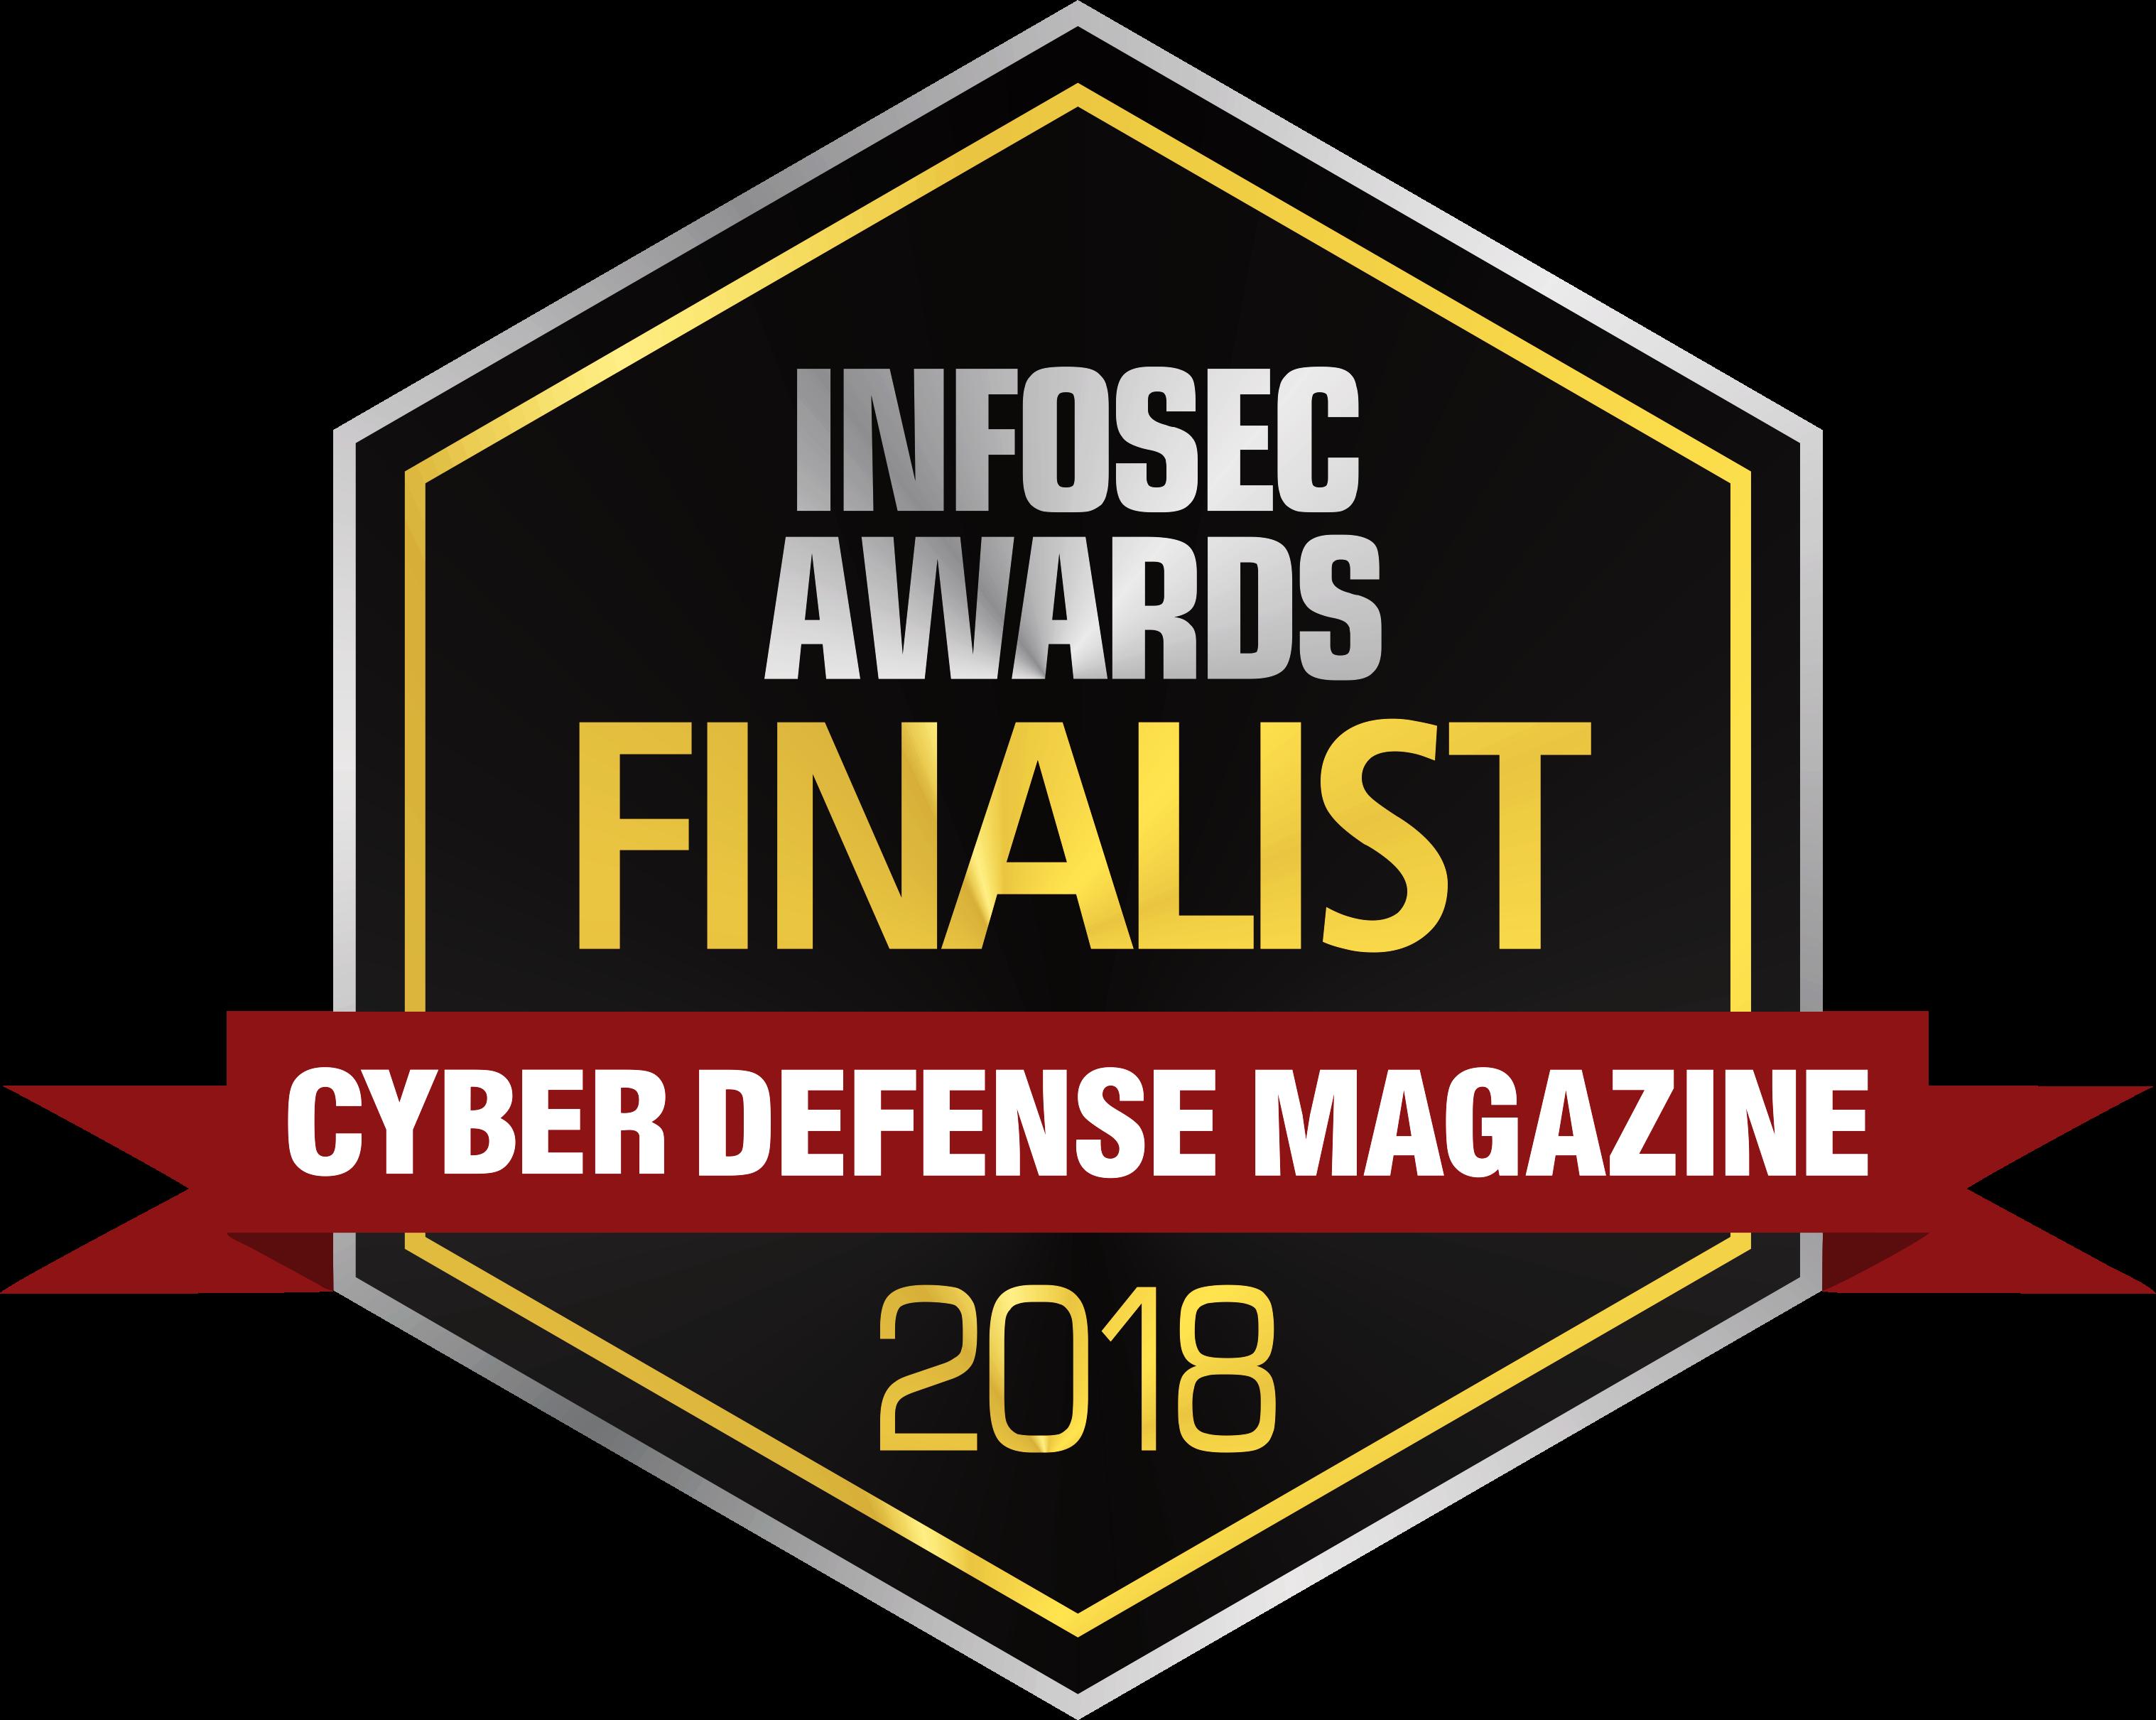 CDM-INFOSEC-AWARDS-FINALIST-EX-LARGE-LOGO-2018